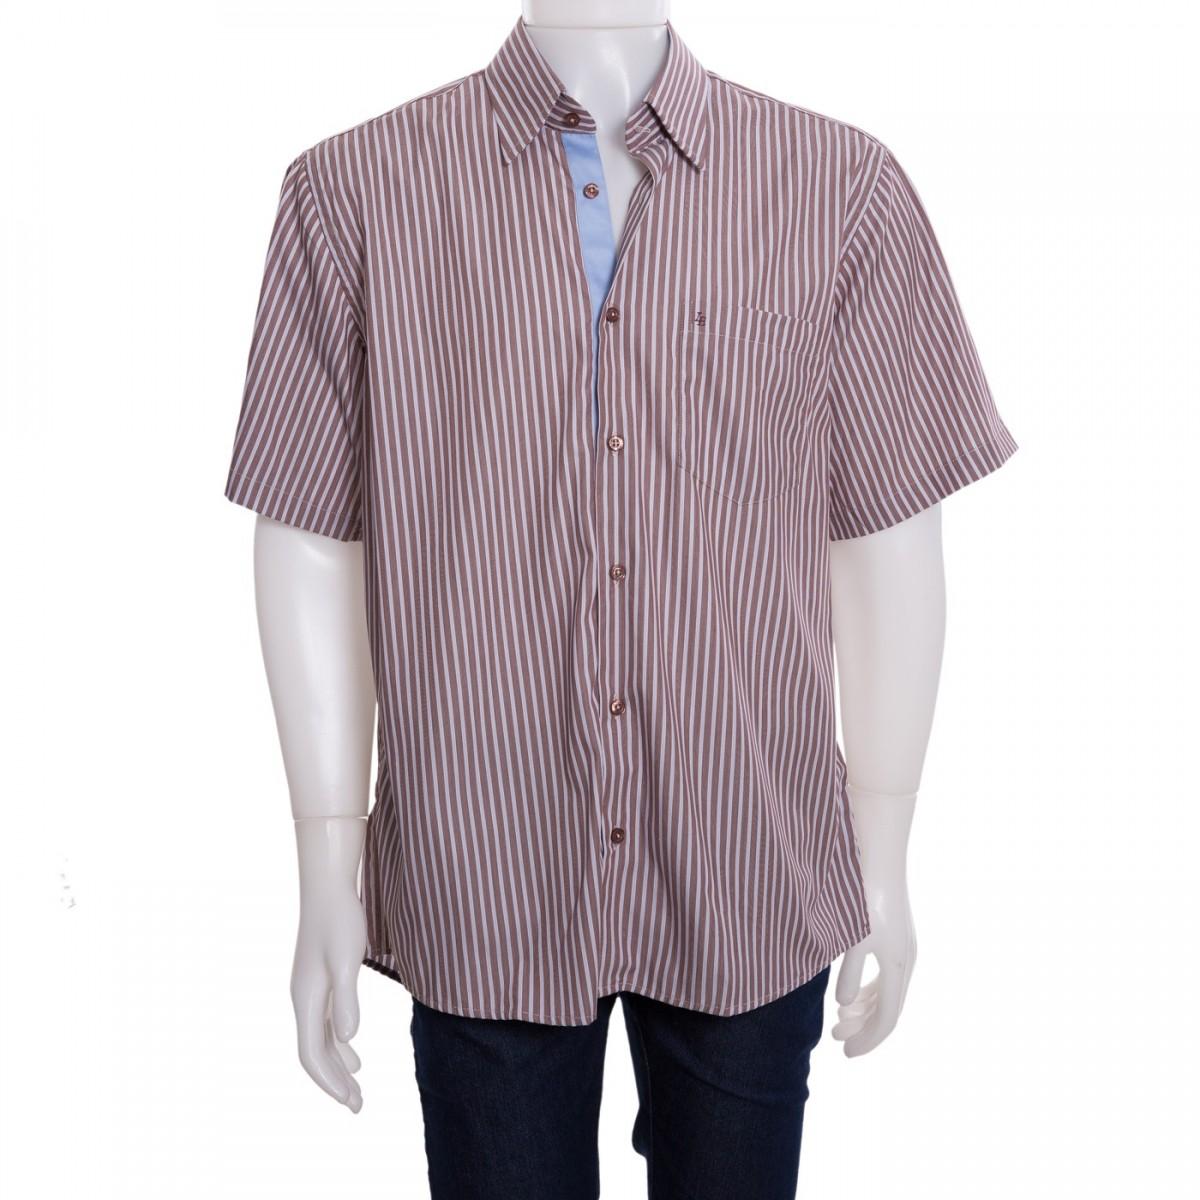 3c2f5ee3a455c Bizz Store - Camisa Social Masculina Luiz Eugenio Fio 100 Listrada